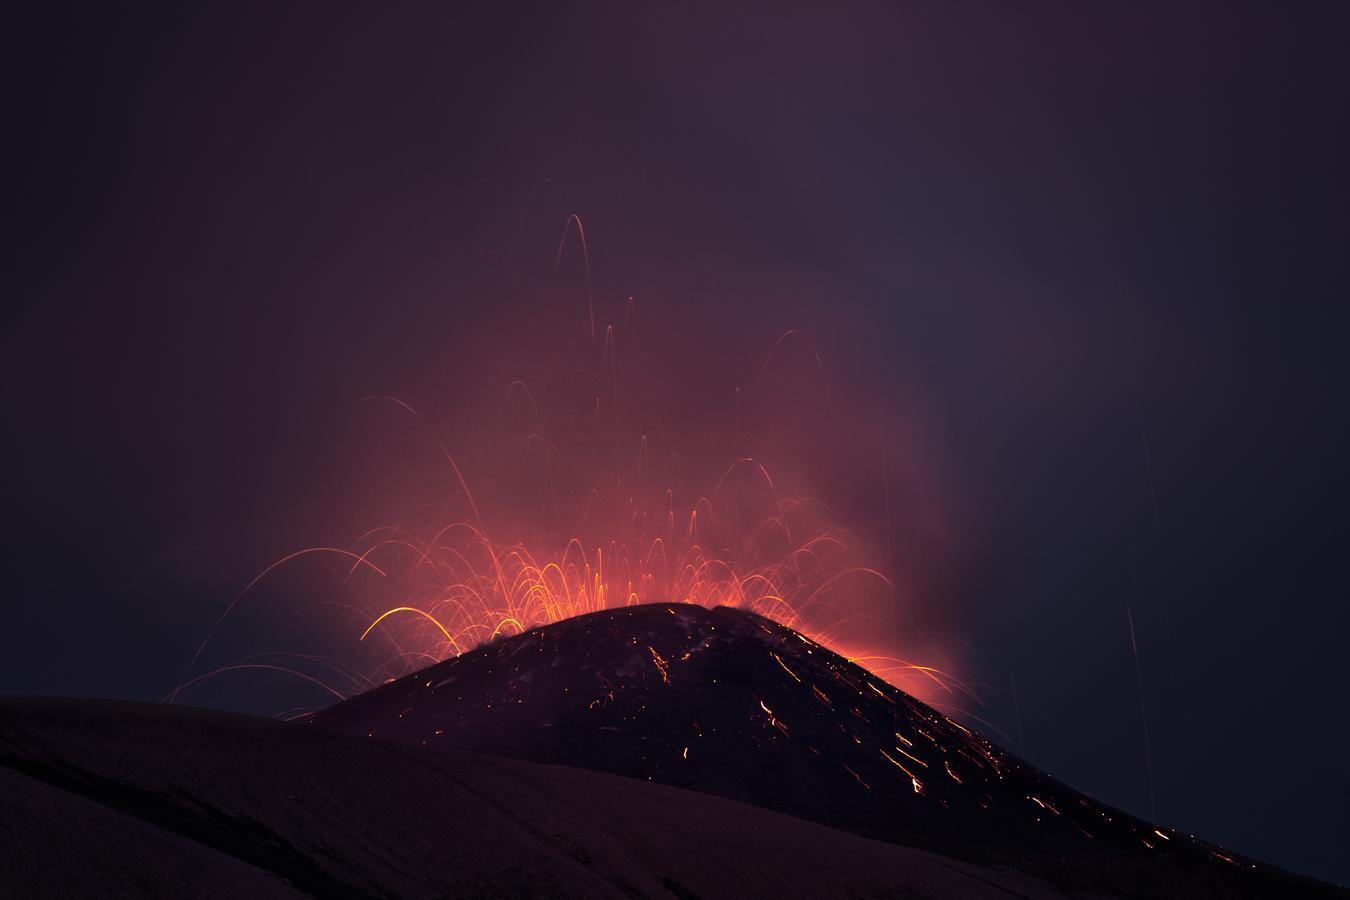 Eruzione vulcano Etna Gianluca Musmeci